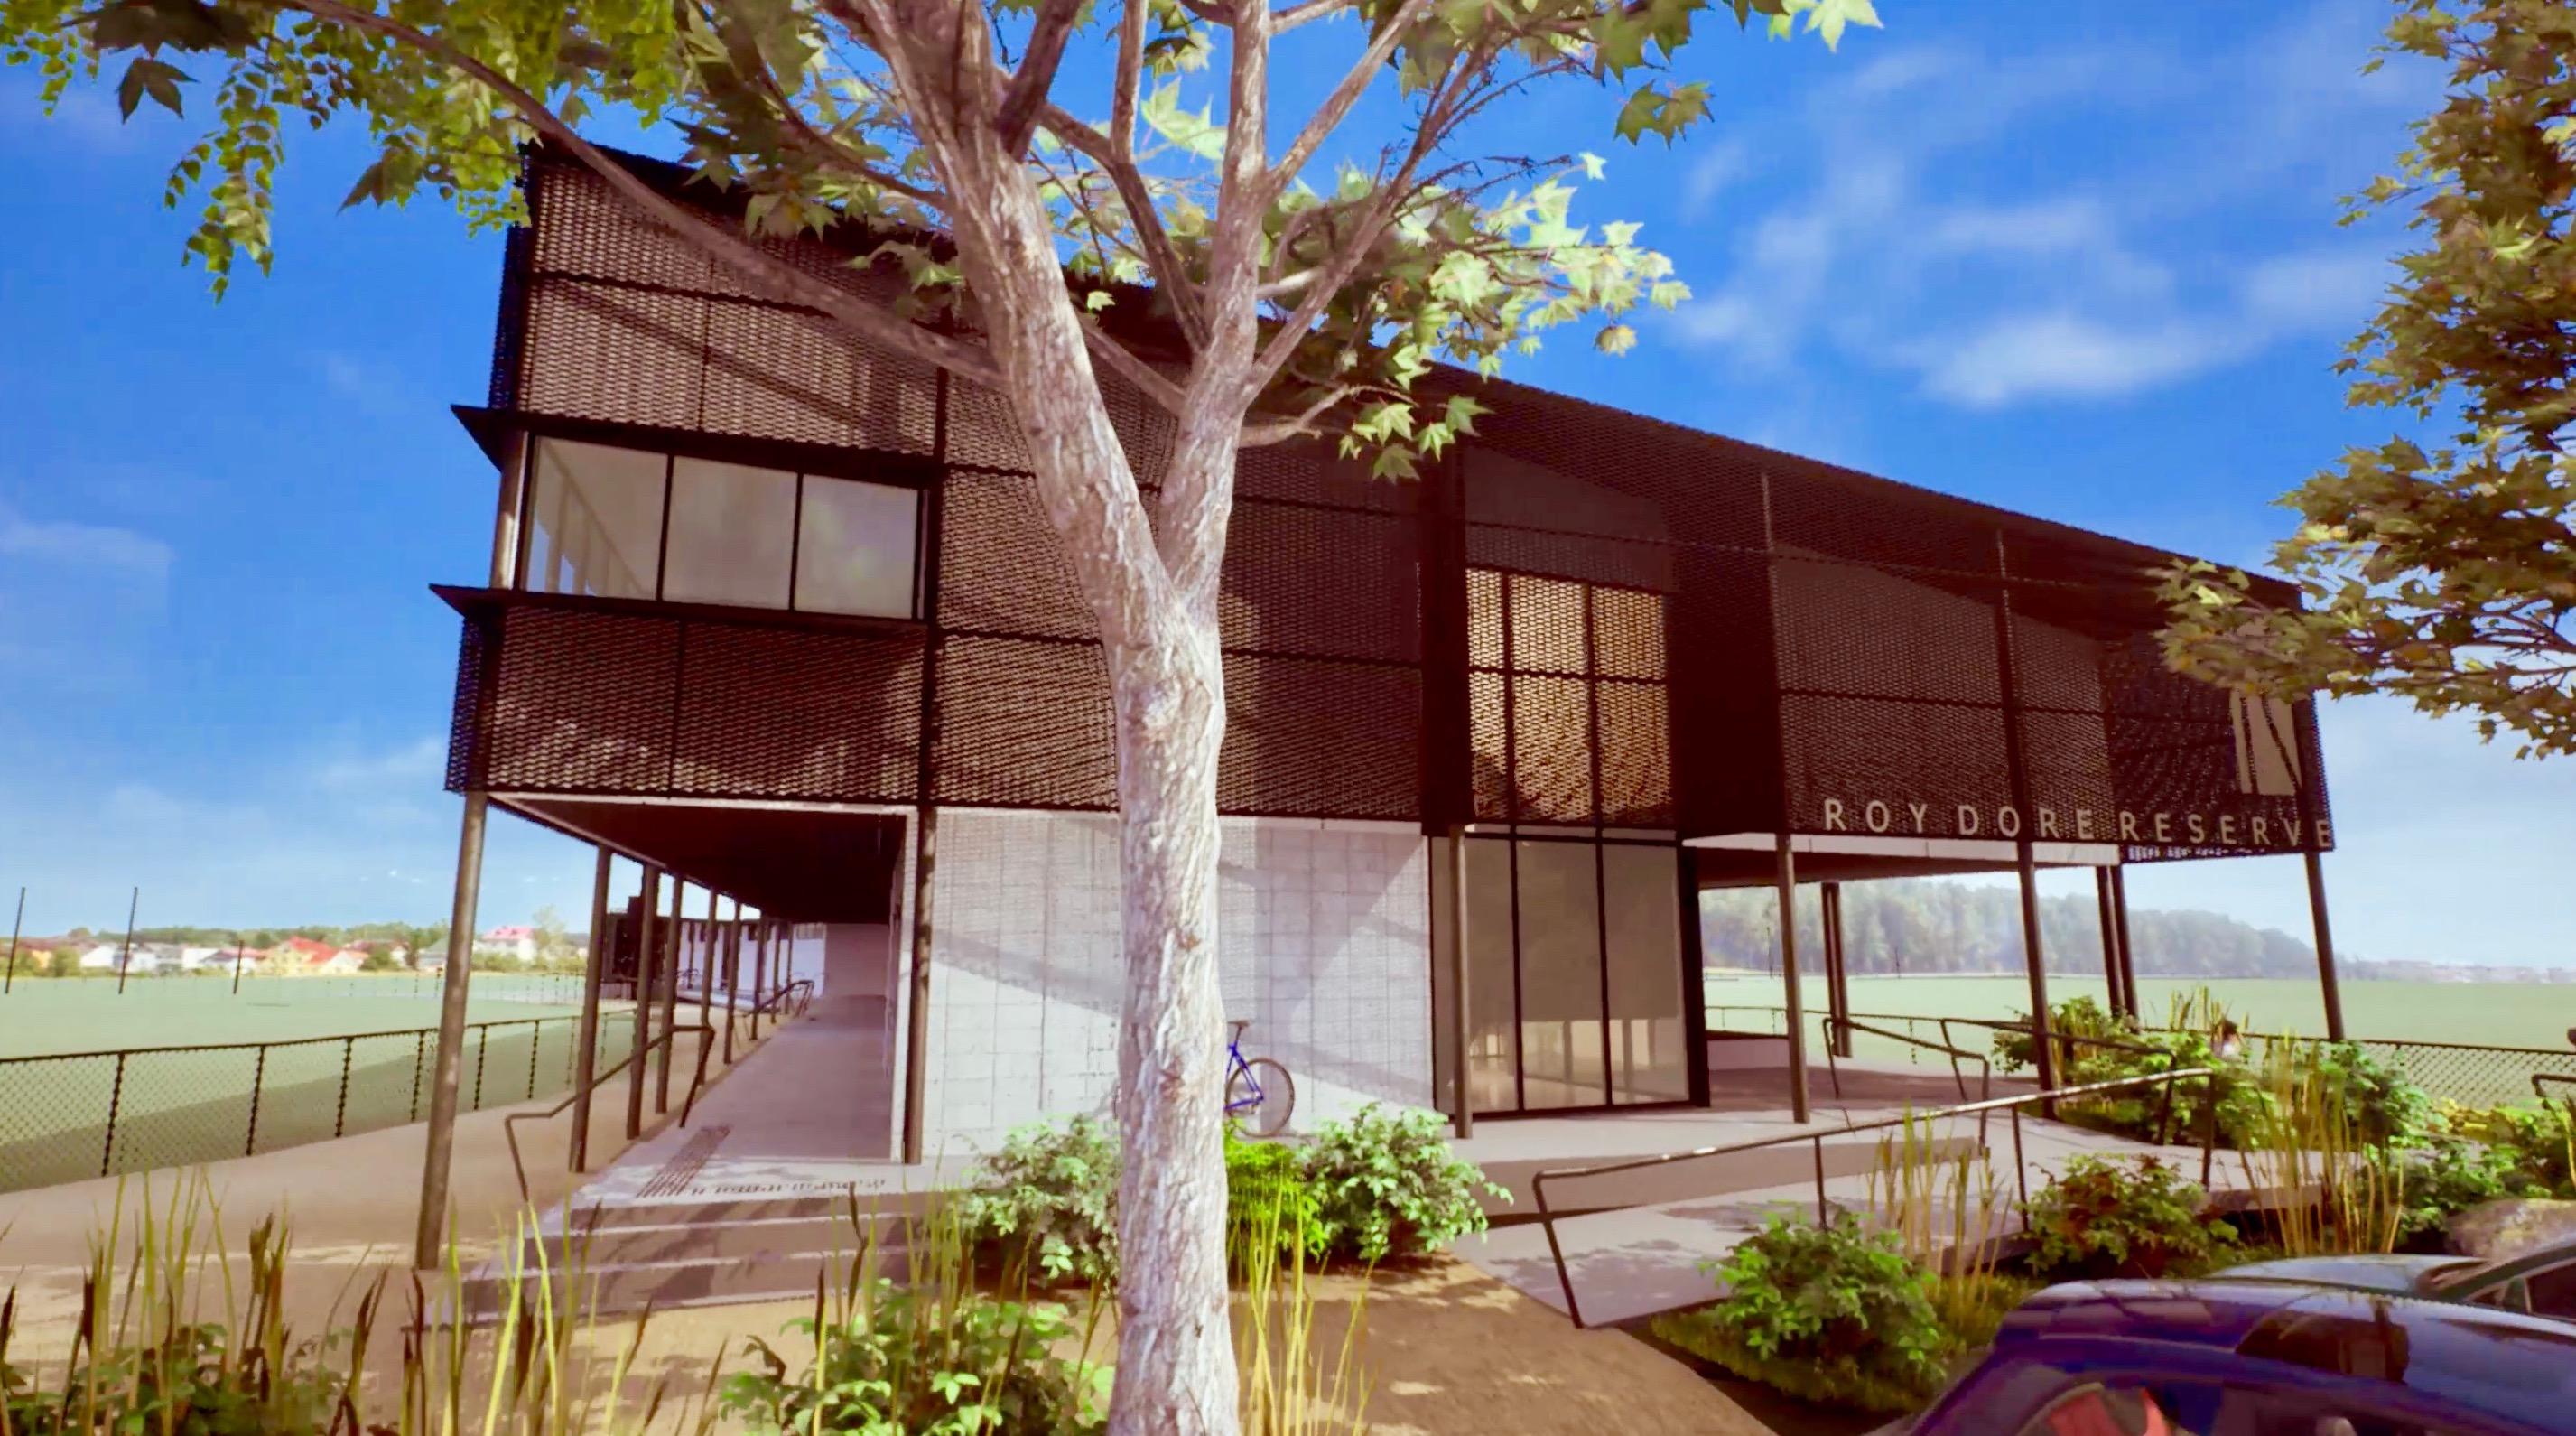 roy dore reserve redevelopment carrum cameron howe